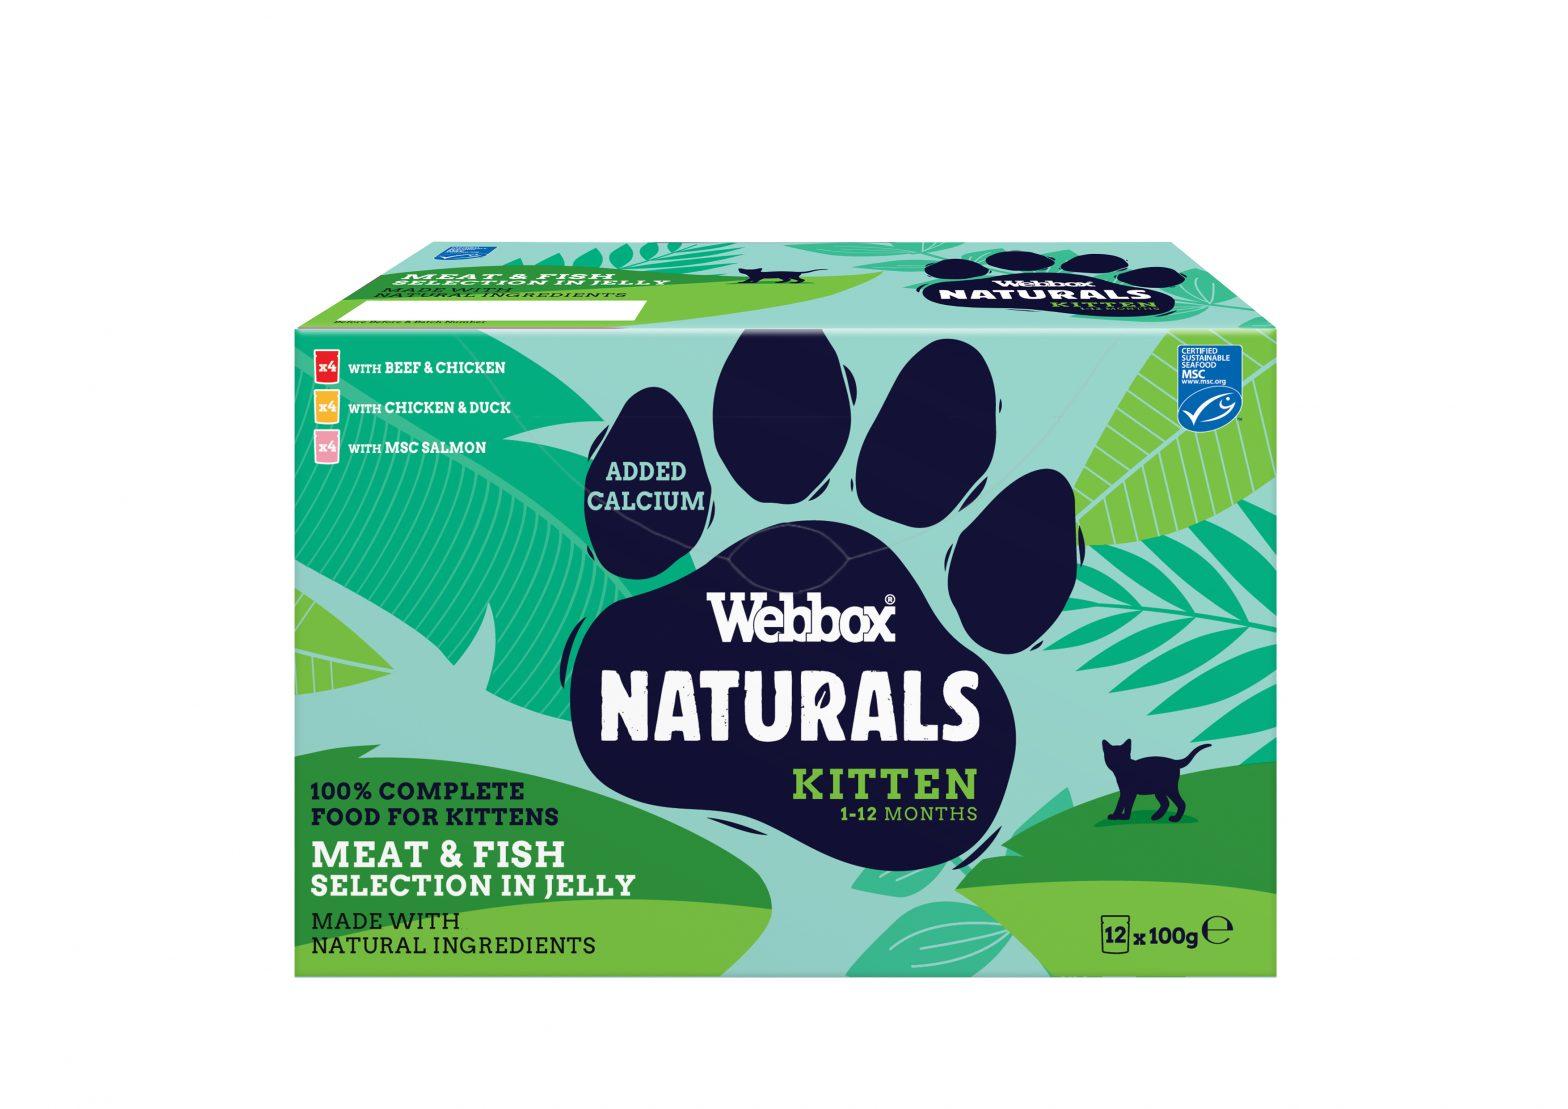 Webbox Naturals Kitten Selection Jelly Wet Cat Food